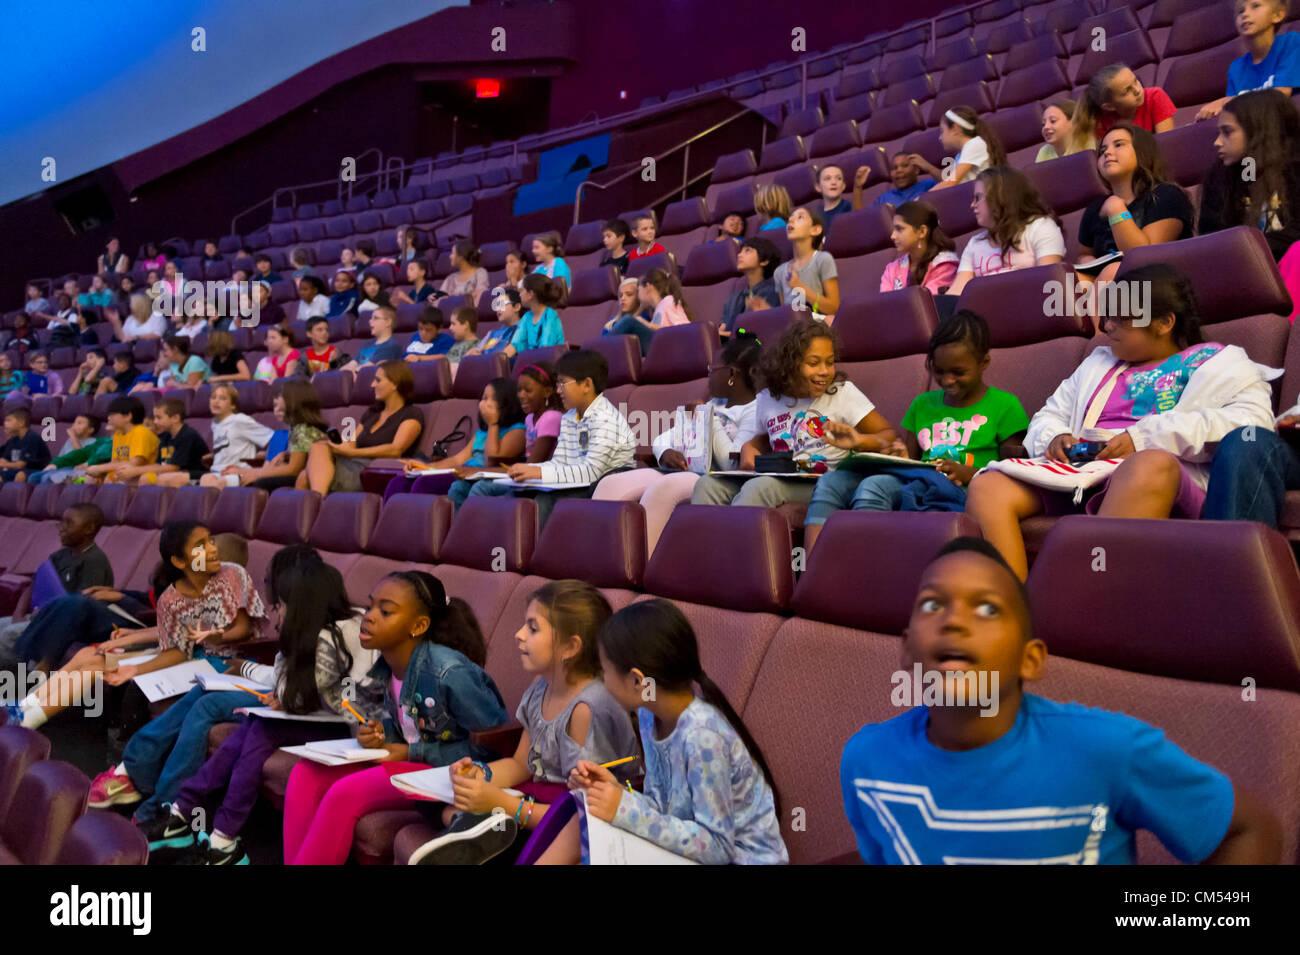 Oct 4, 2012 - GARDEN CITY, NEW YORK U.S. - At new JetBlue Sky Theater Planetarium at Cradle of Aviation Museum, - Stock Image